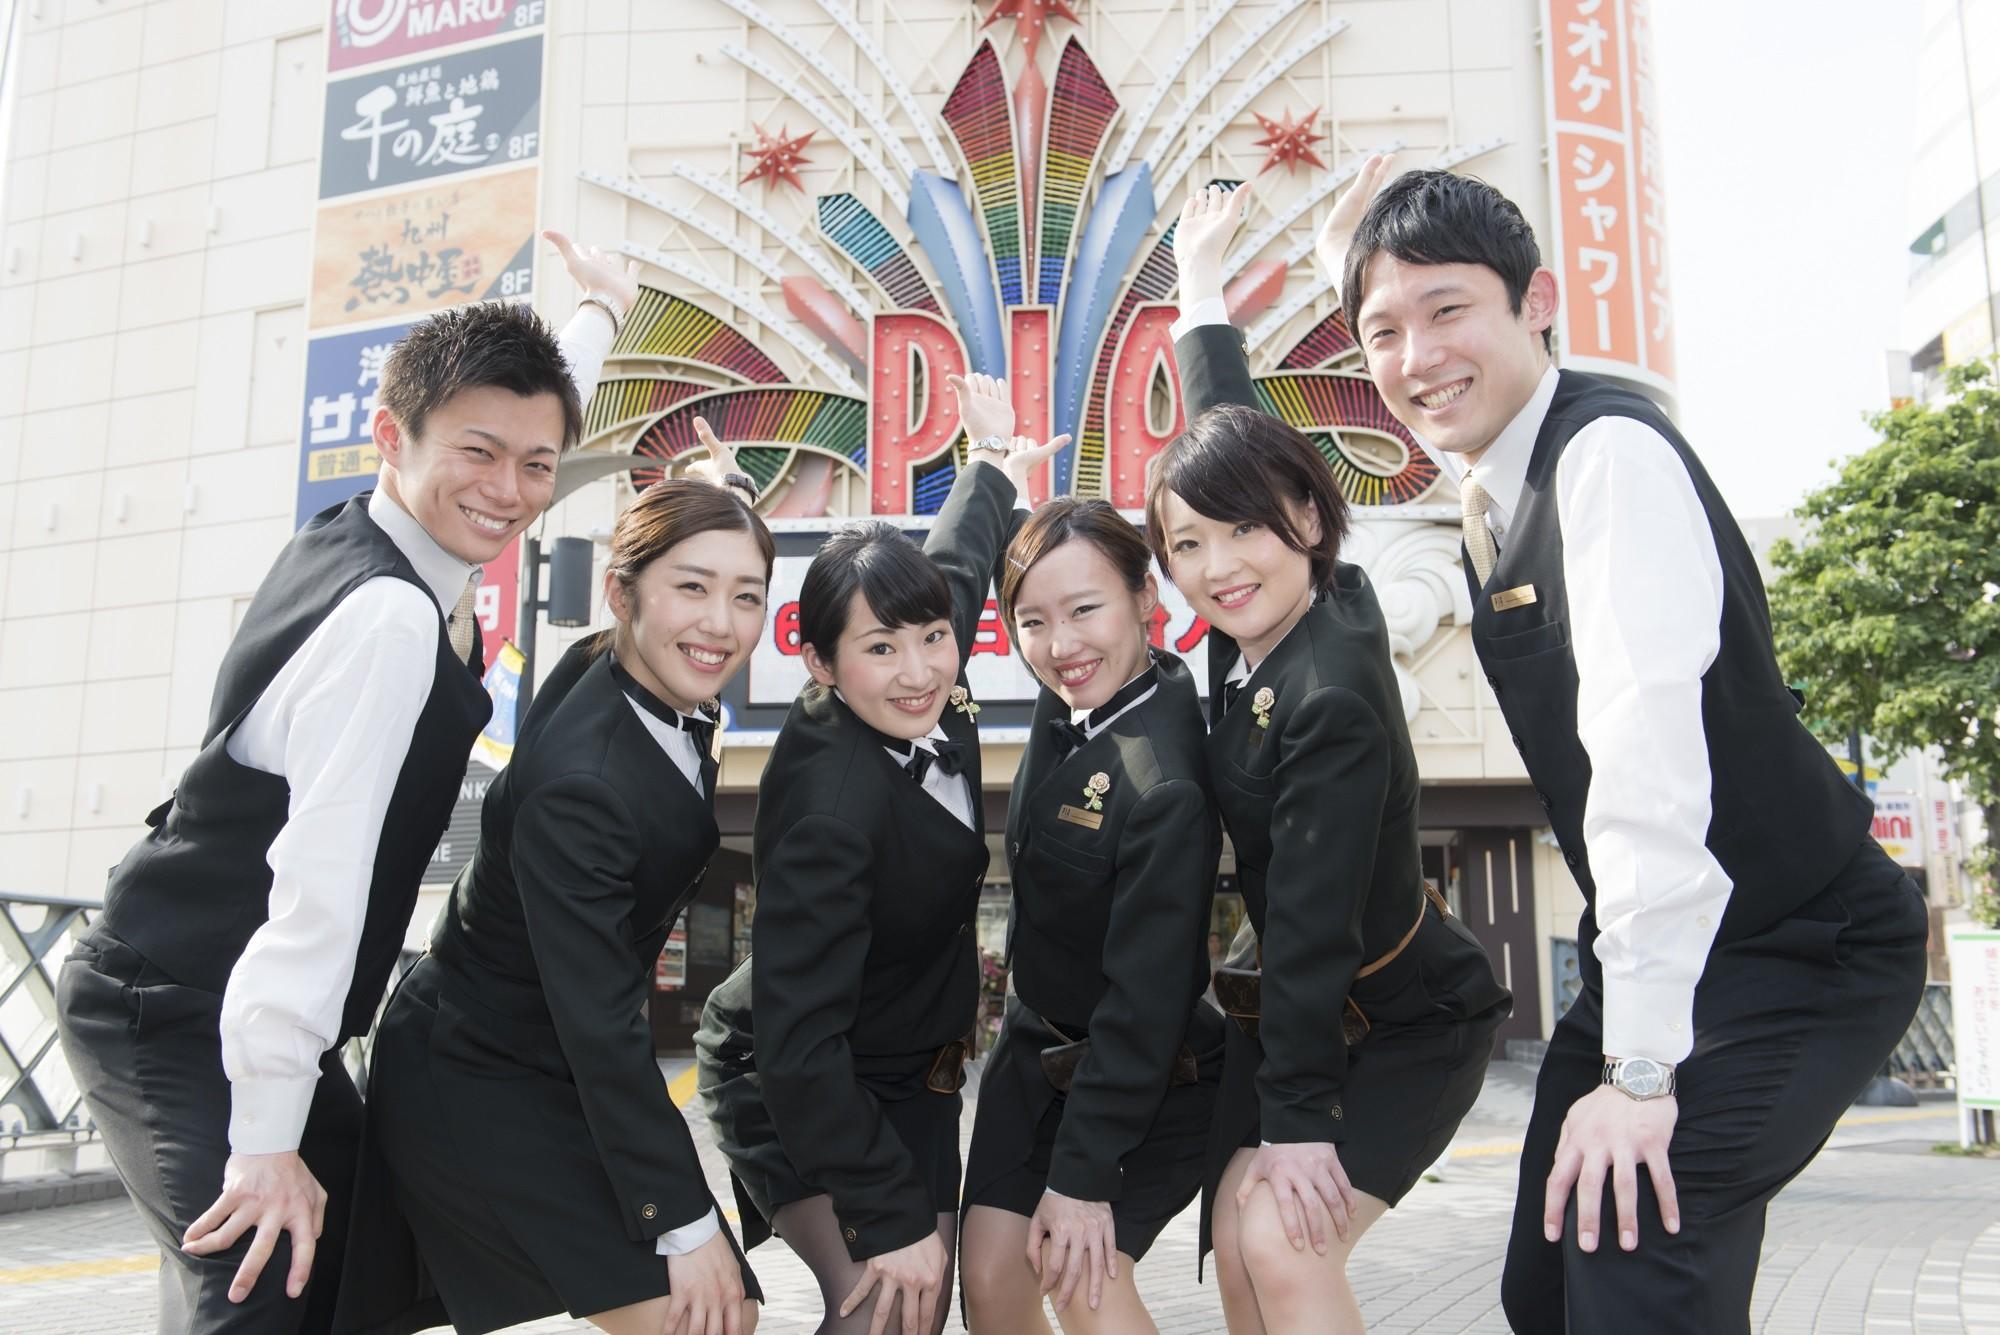 PIA(ピア) 横浜西口店 ホールスタッフのアルバイト情報